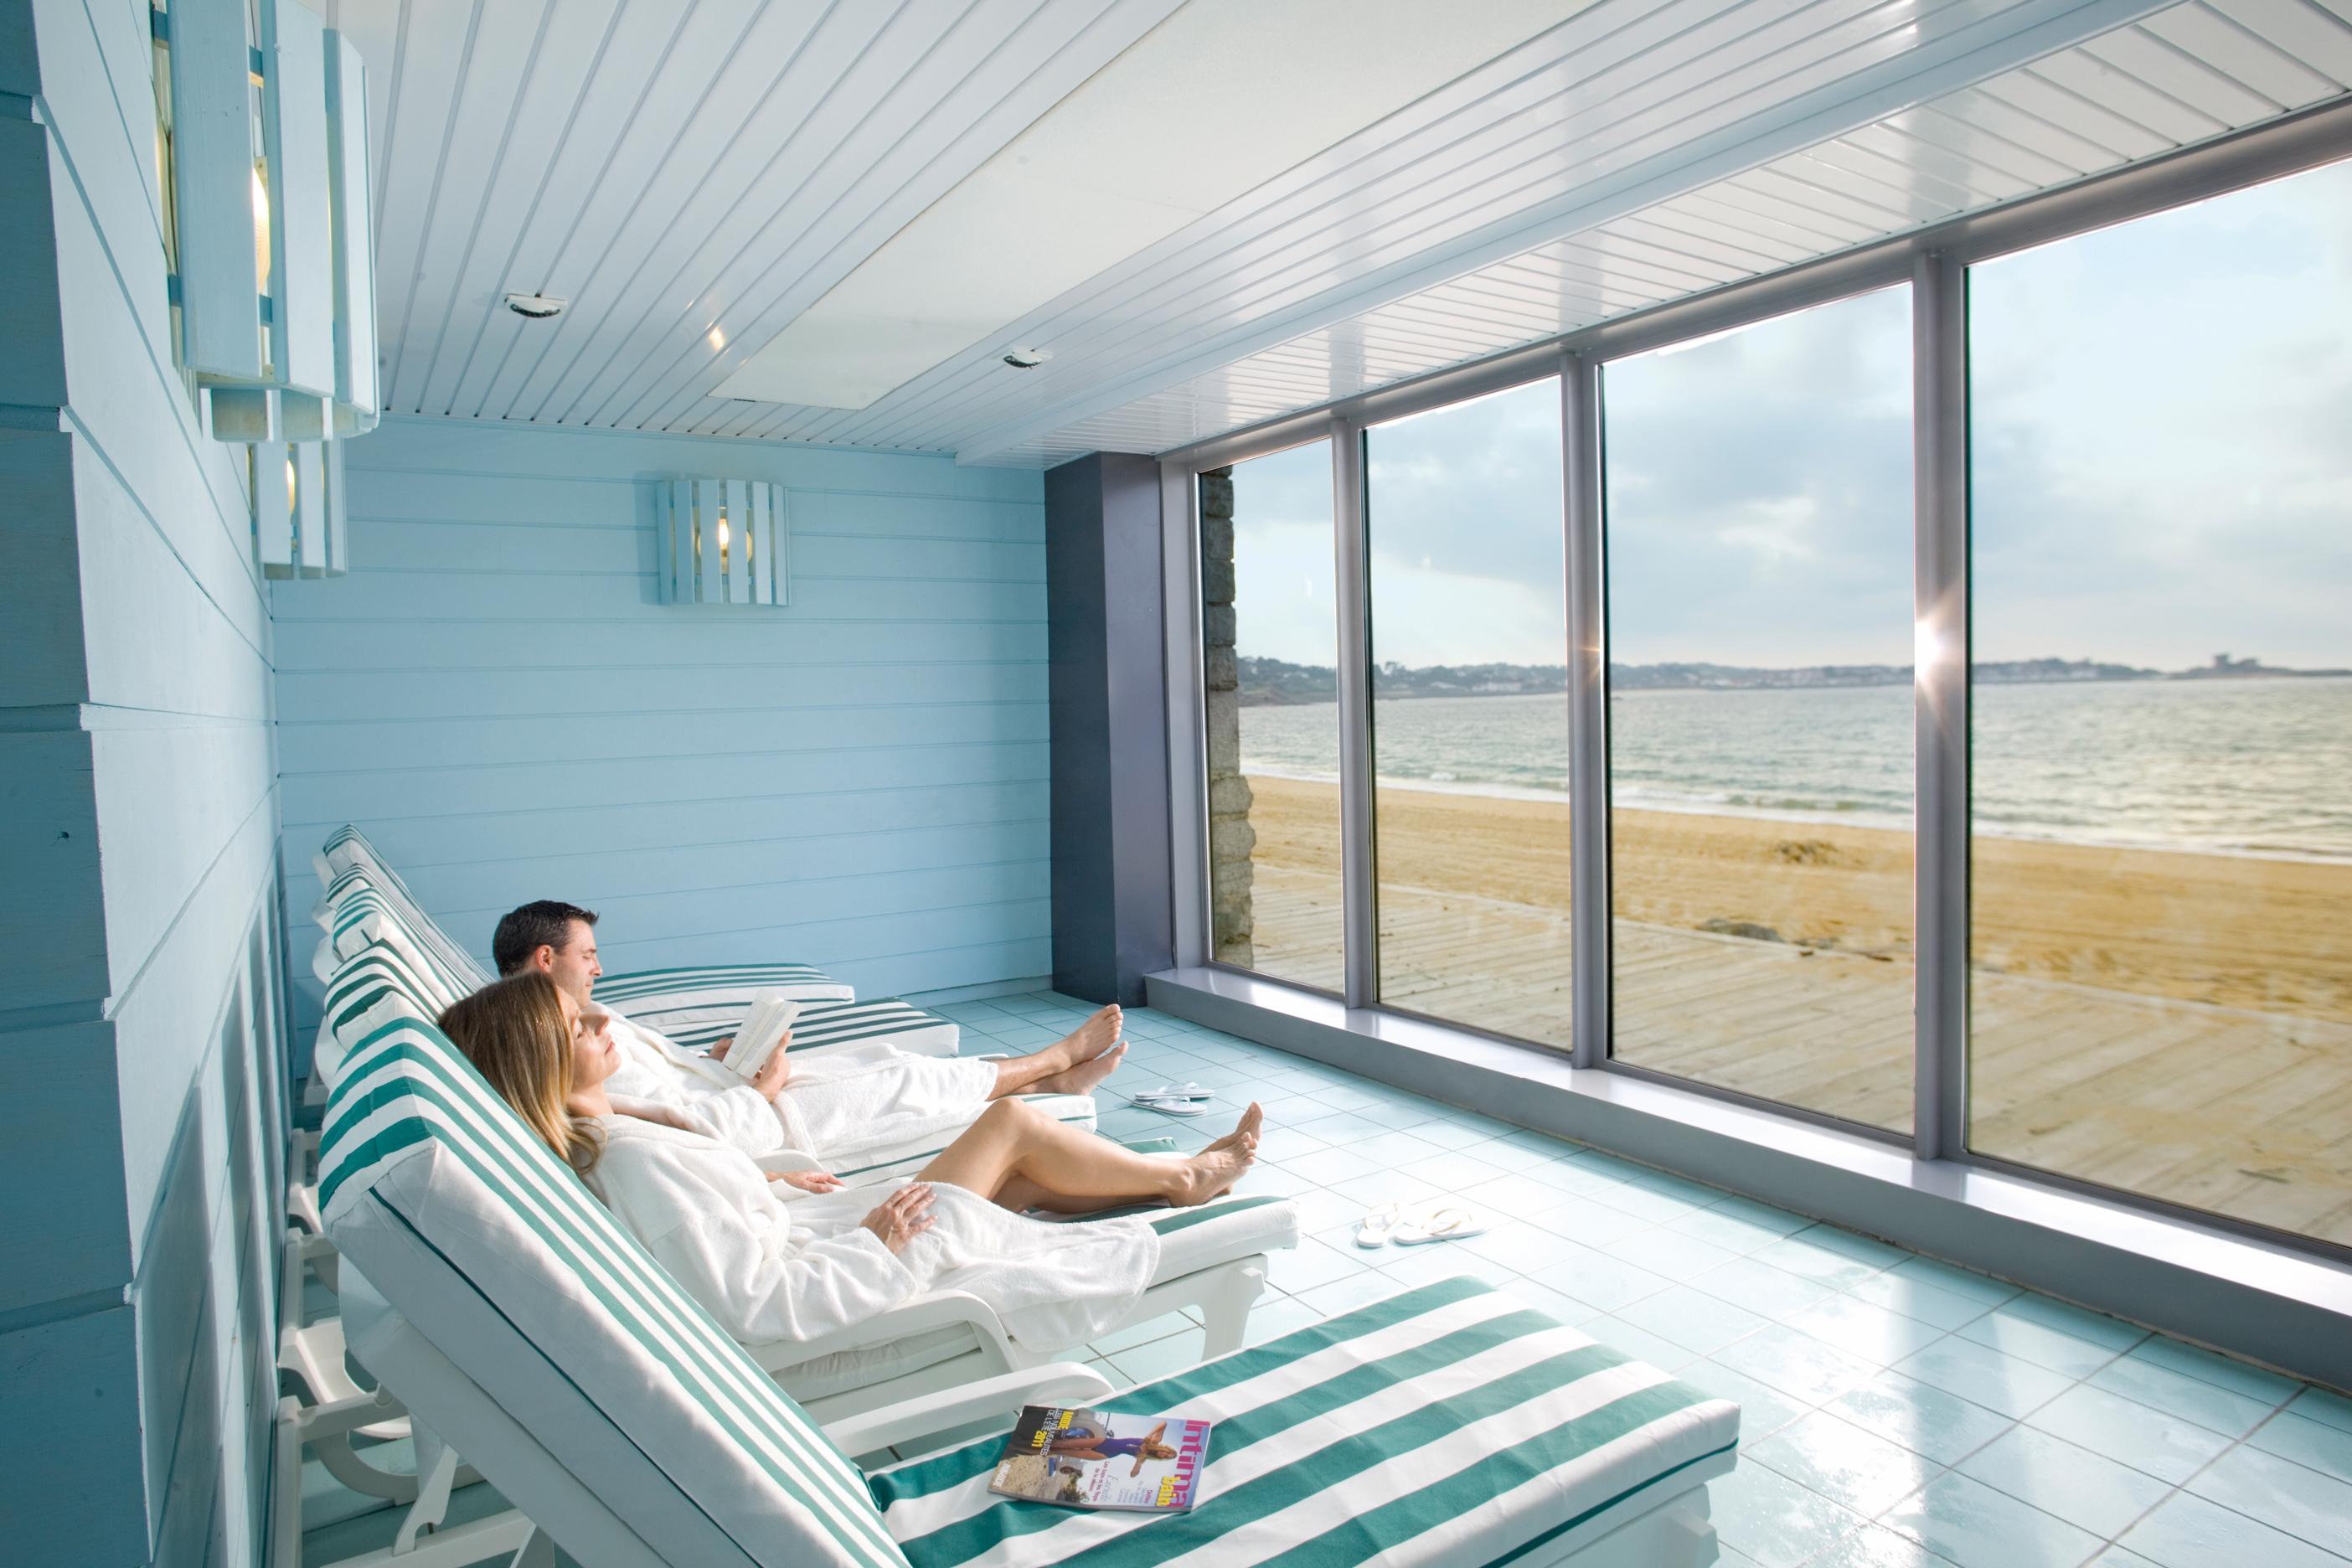 galerie photos le blog i love thalasso thalazur. Black Bedroom Furniture Sets. Home Design Ideas